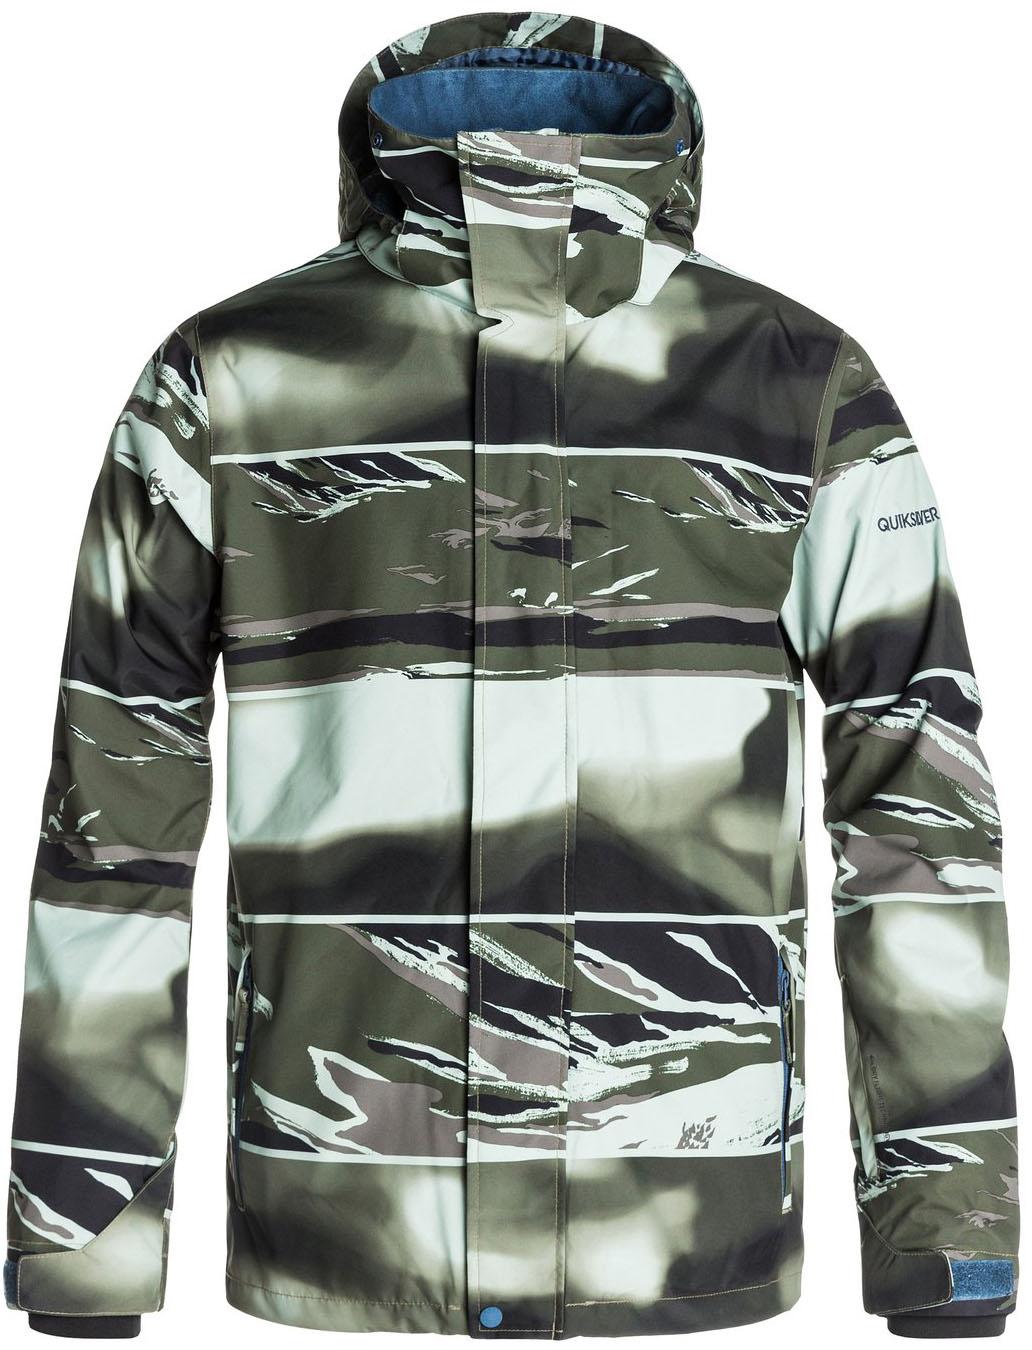 image quiksilver-mission-printed-jacket-jpg